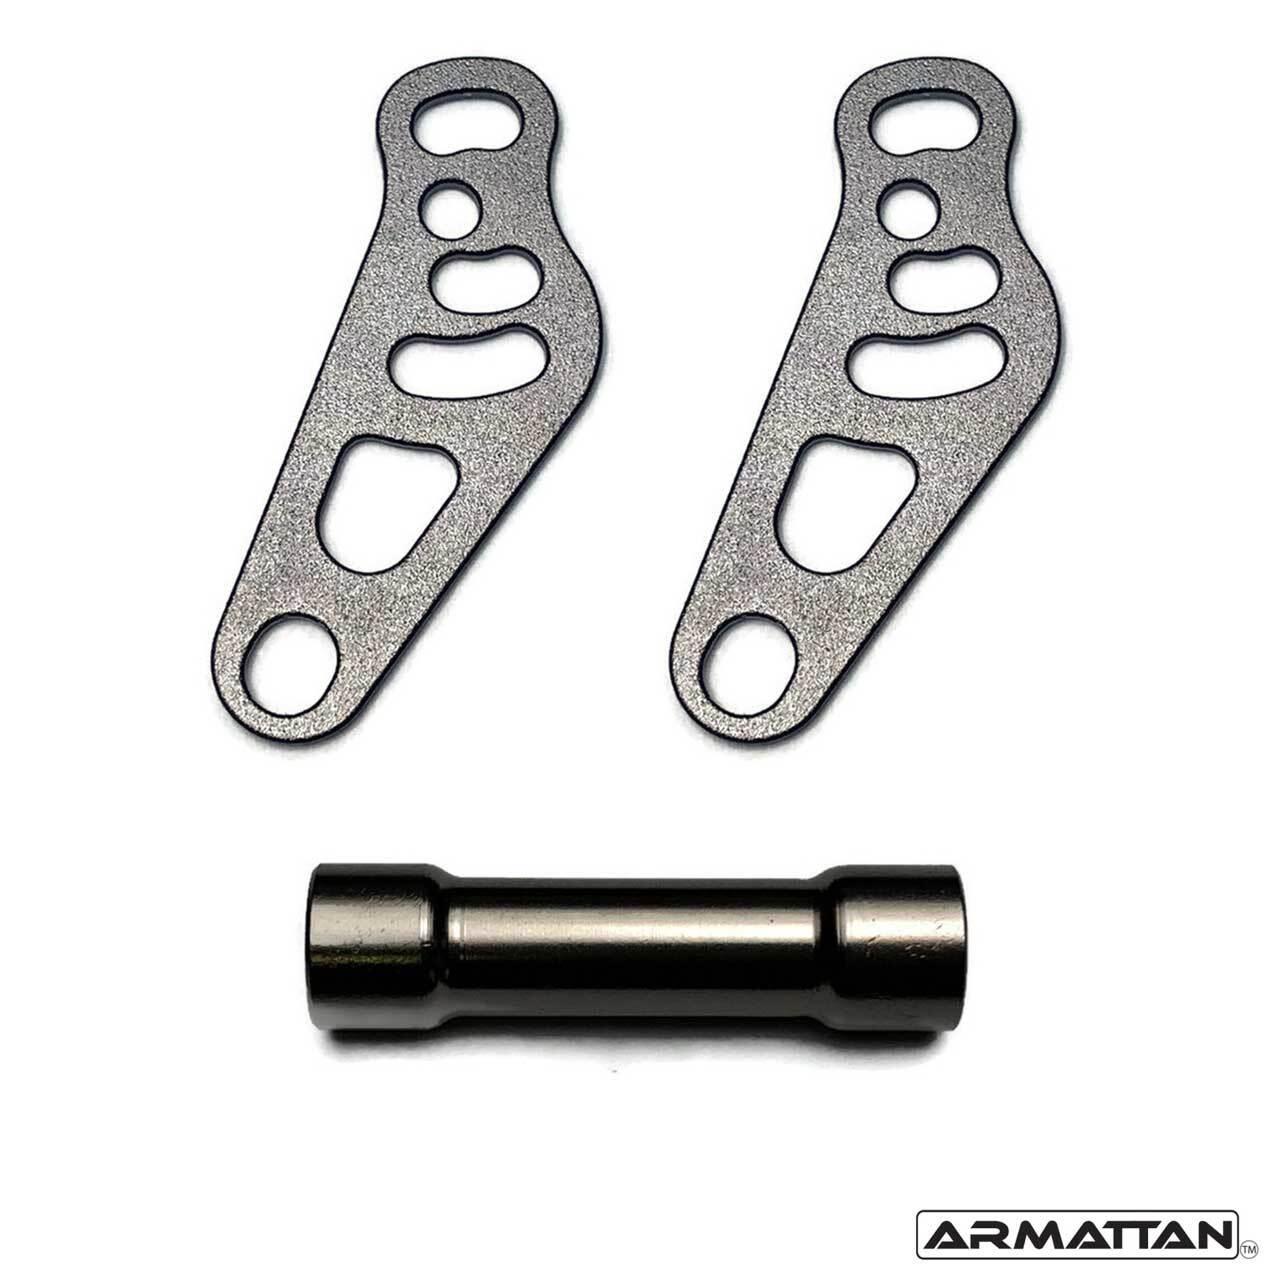 Armattan Marmotte Cam Saver & Standoff セット/アルミ